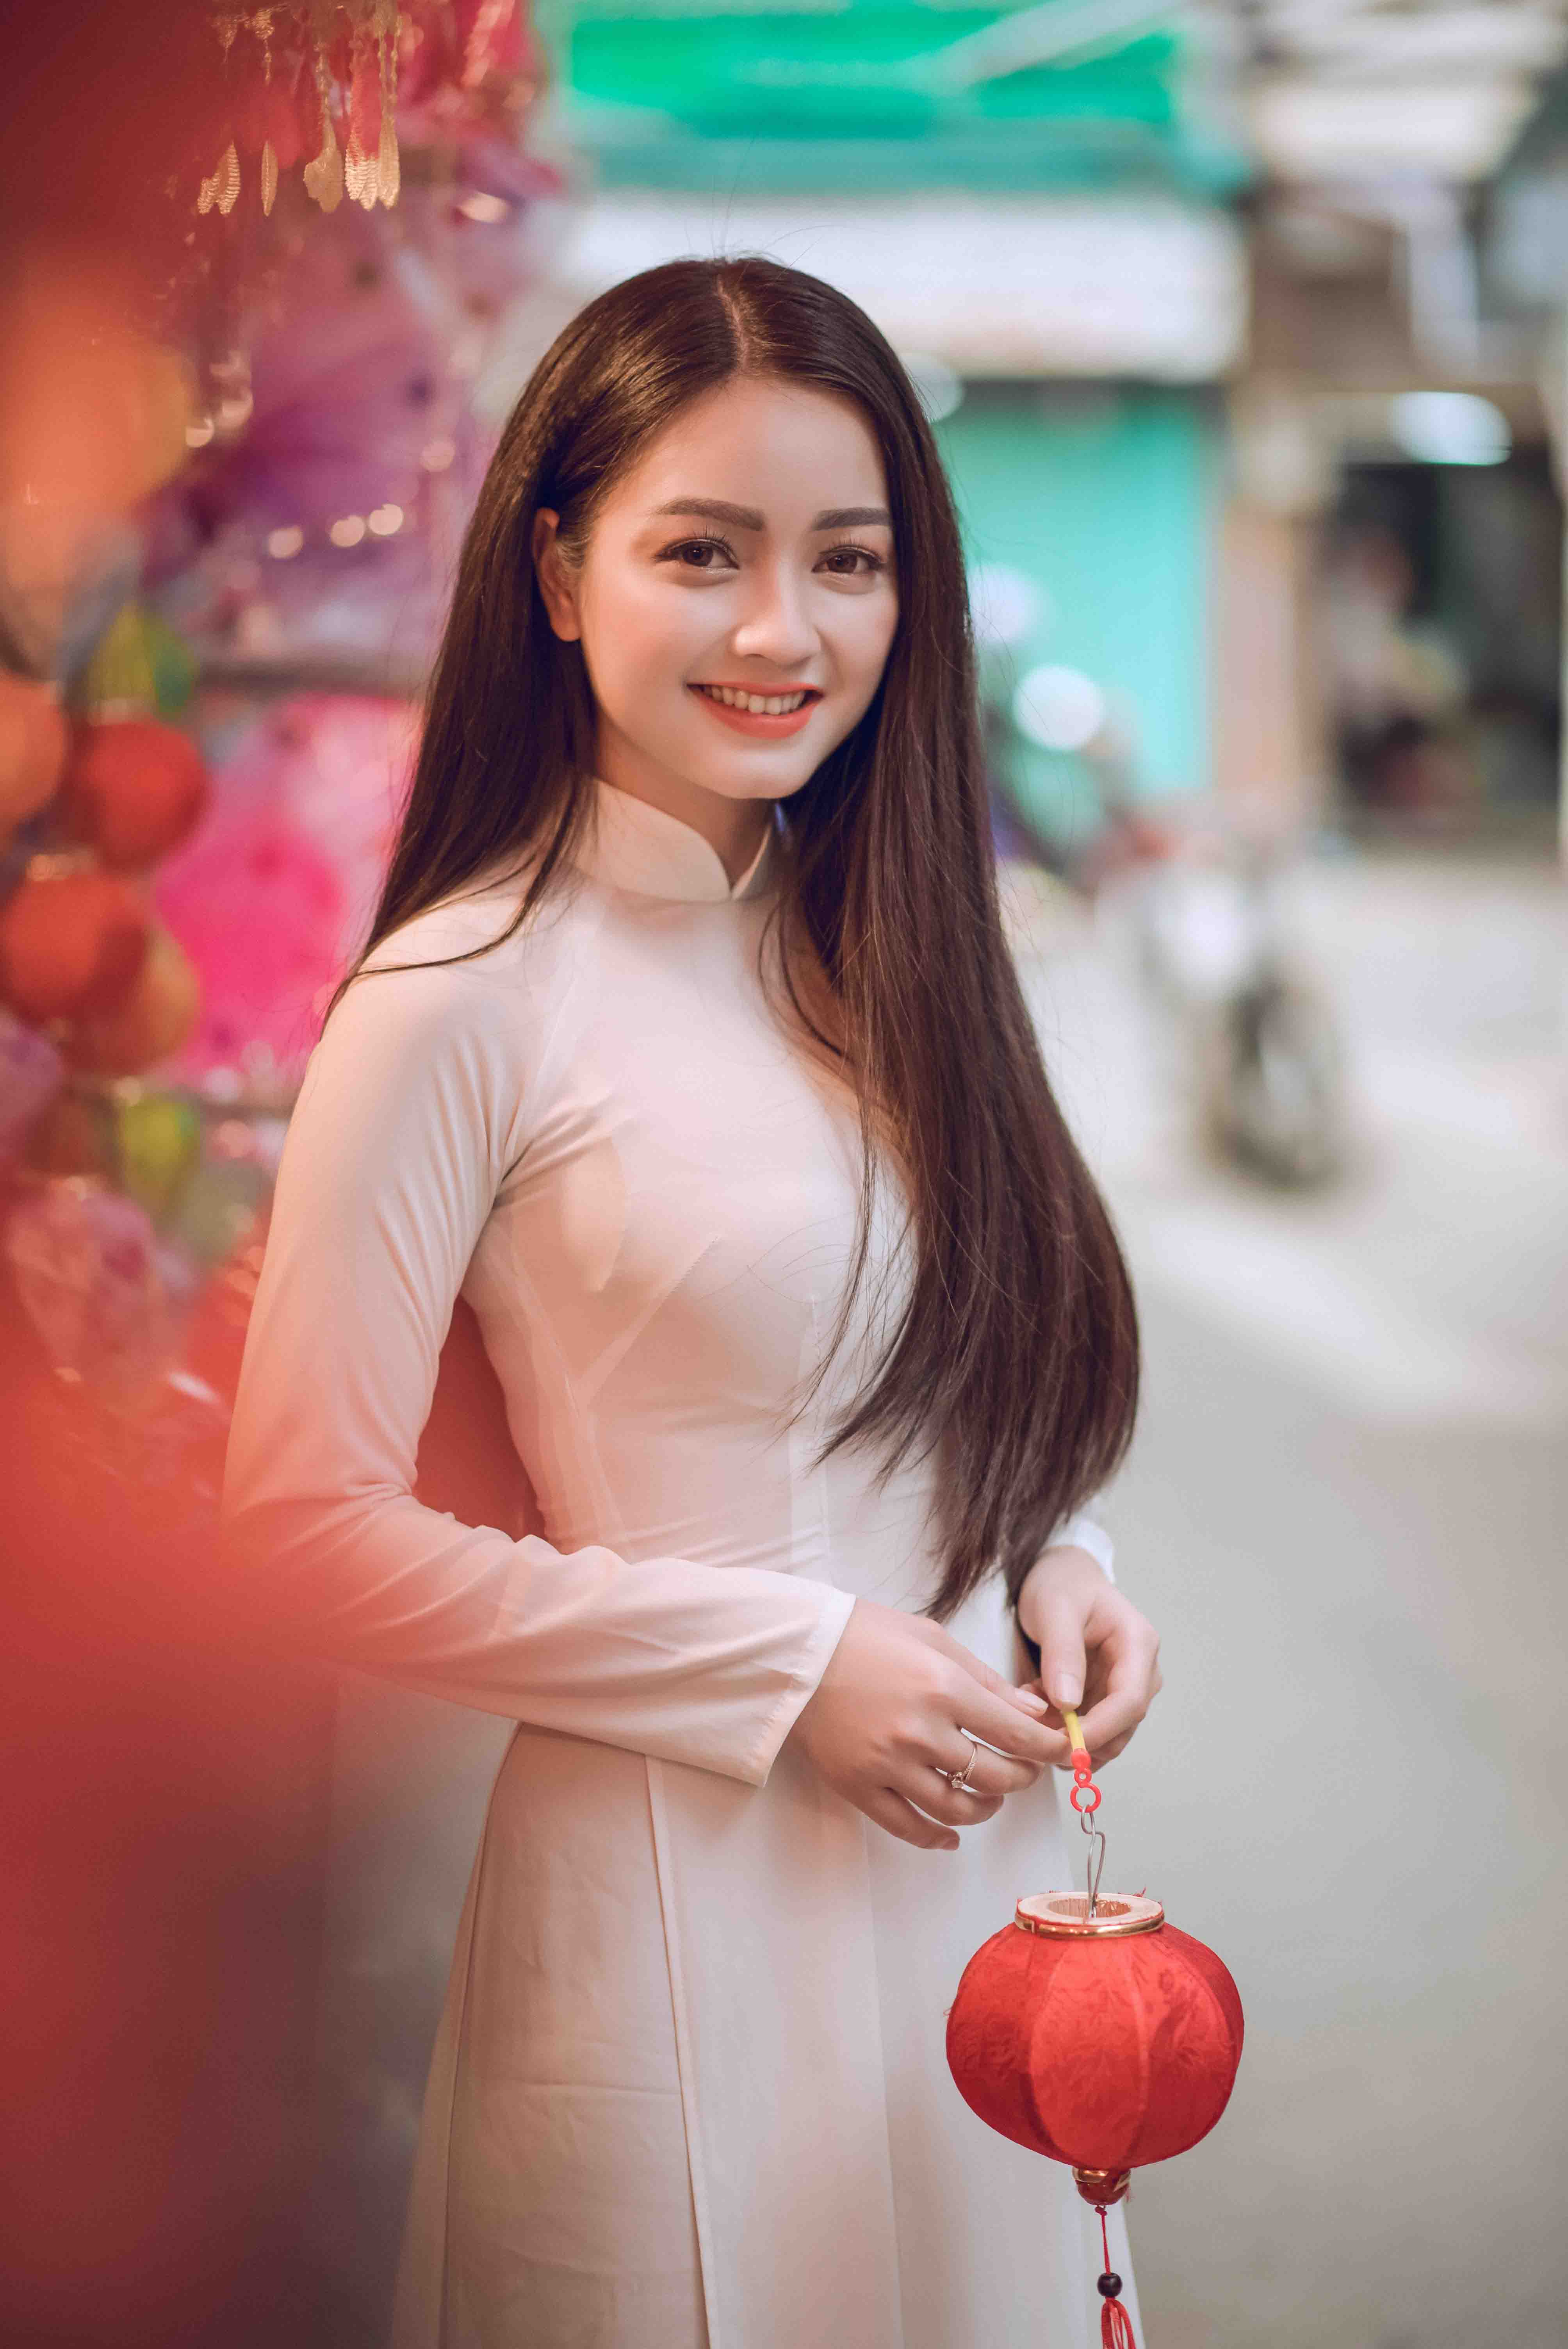 Lush escorts - charming asian